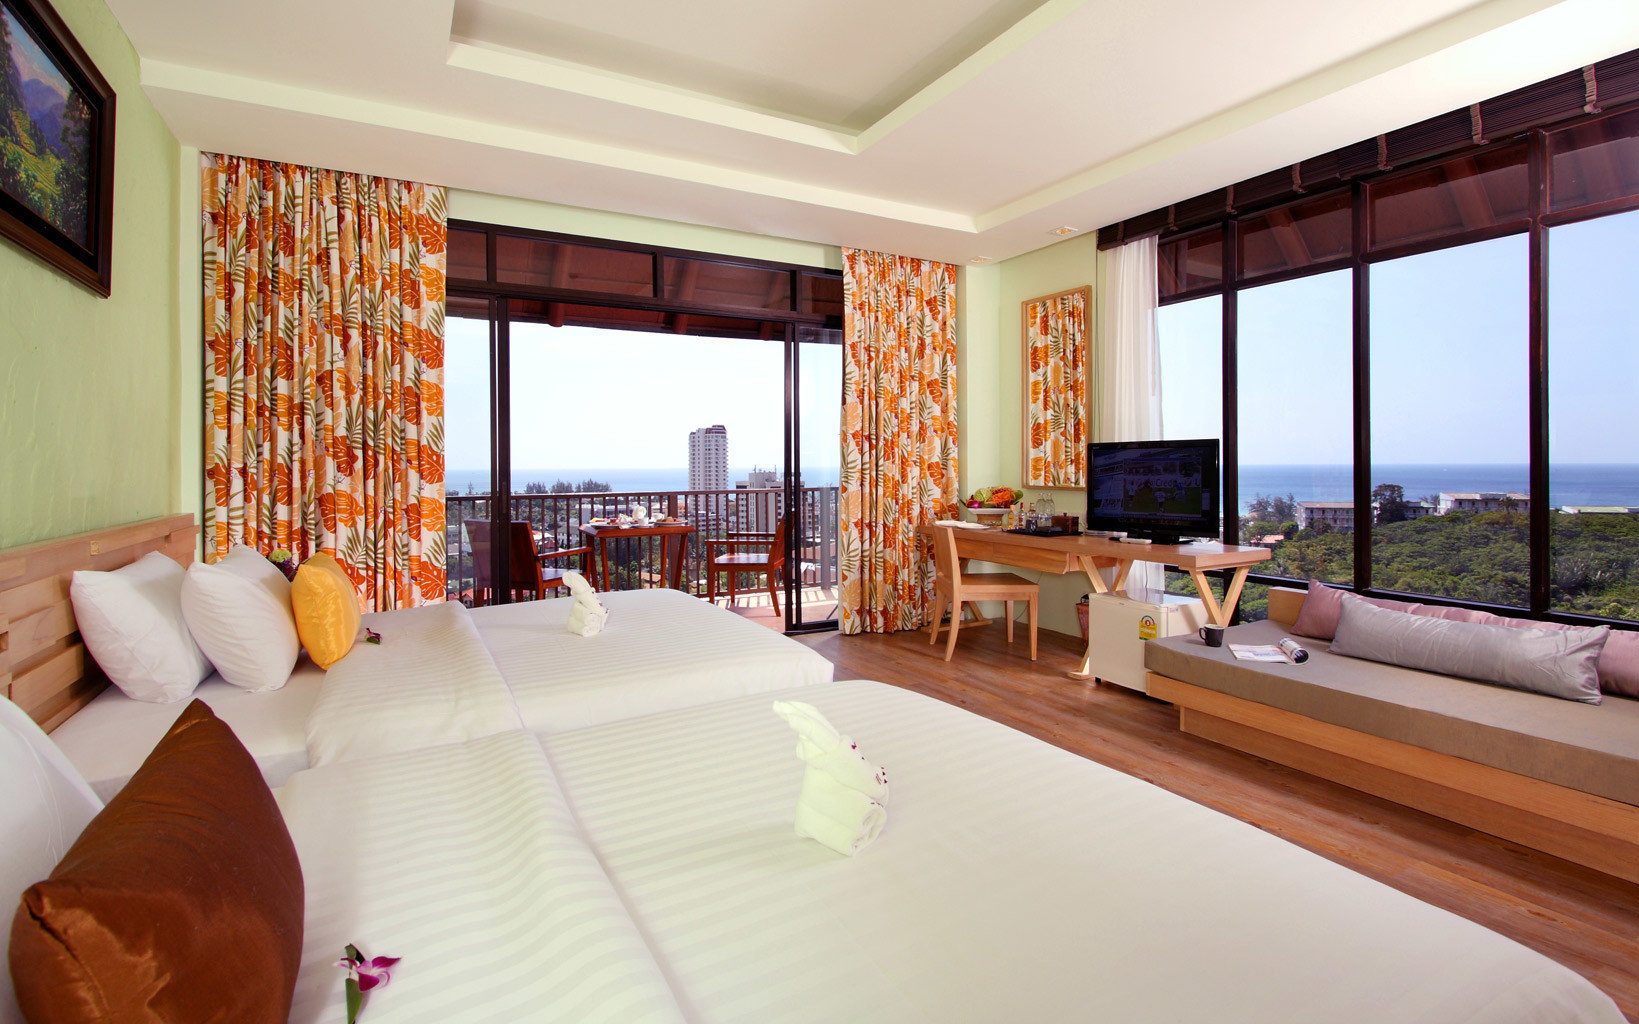 B&B Beachfront Bedroom Scenic views sofa property Resort Suite Villa living room condominium cottage